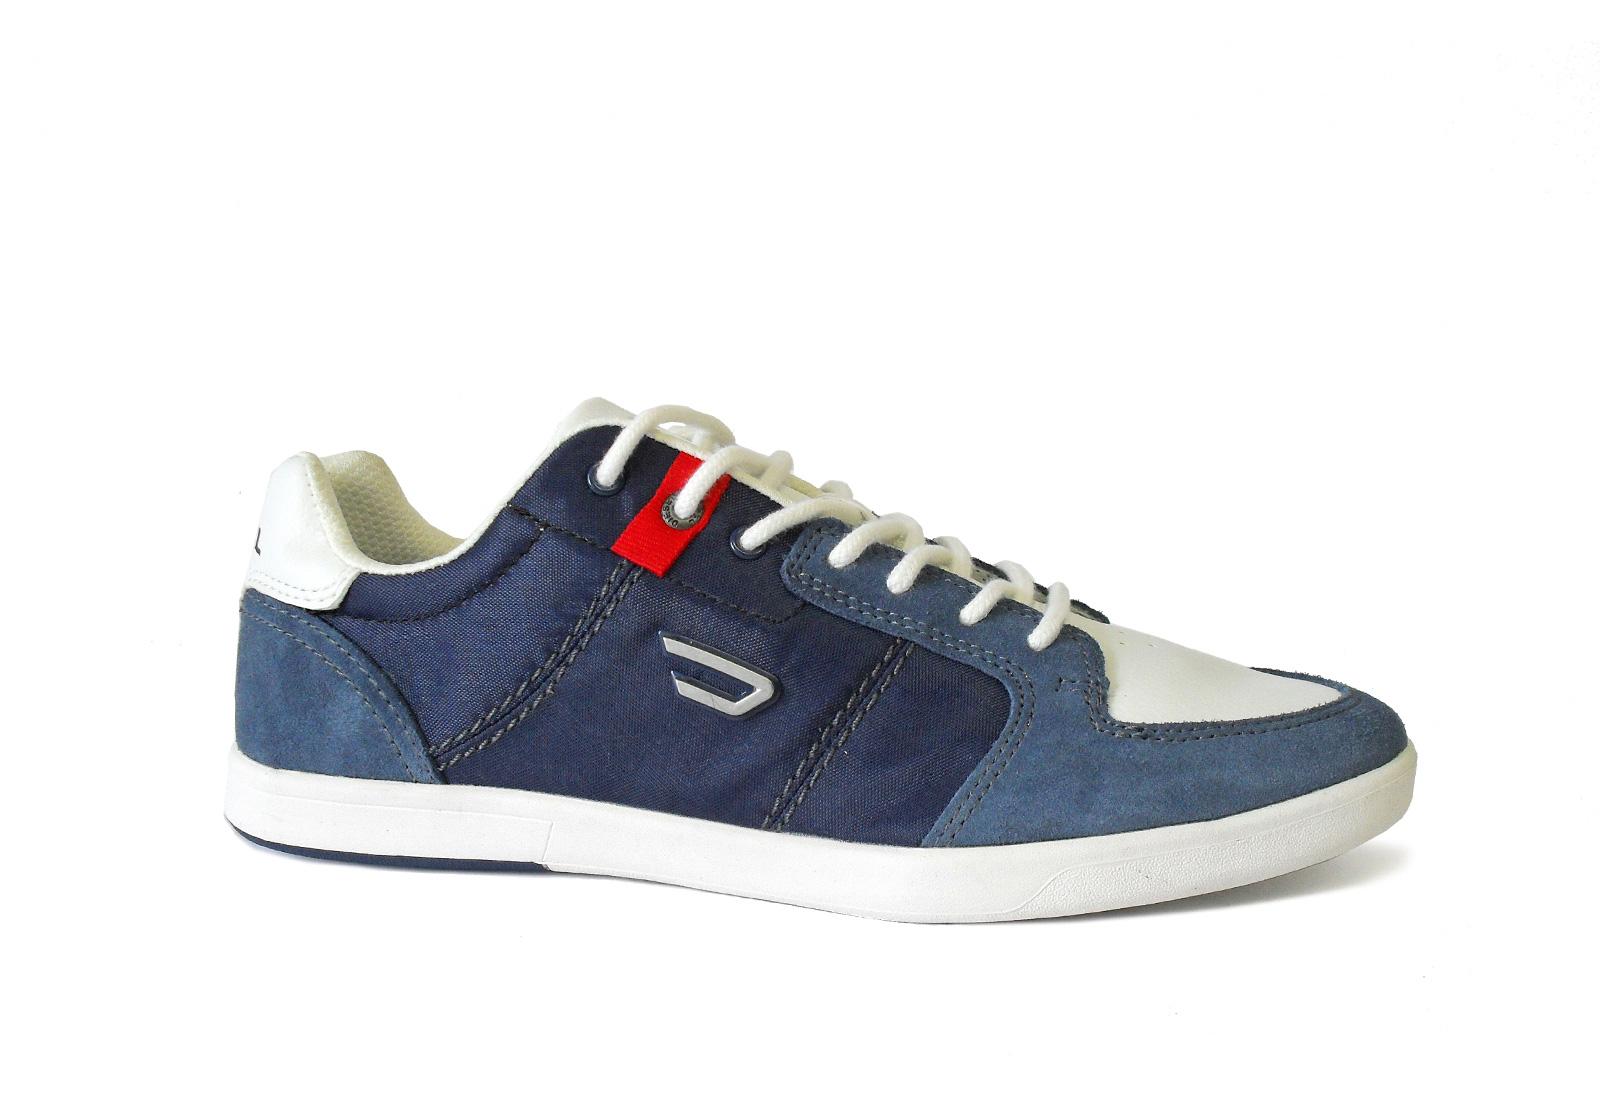 Diesel Shoes - Hutsky - 675-989-4774 - Online shop for ...